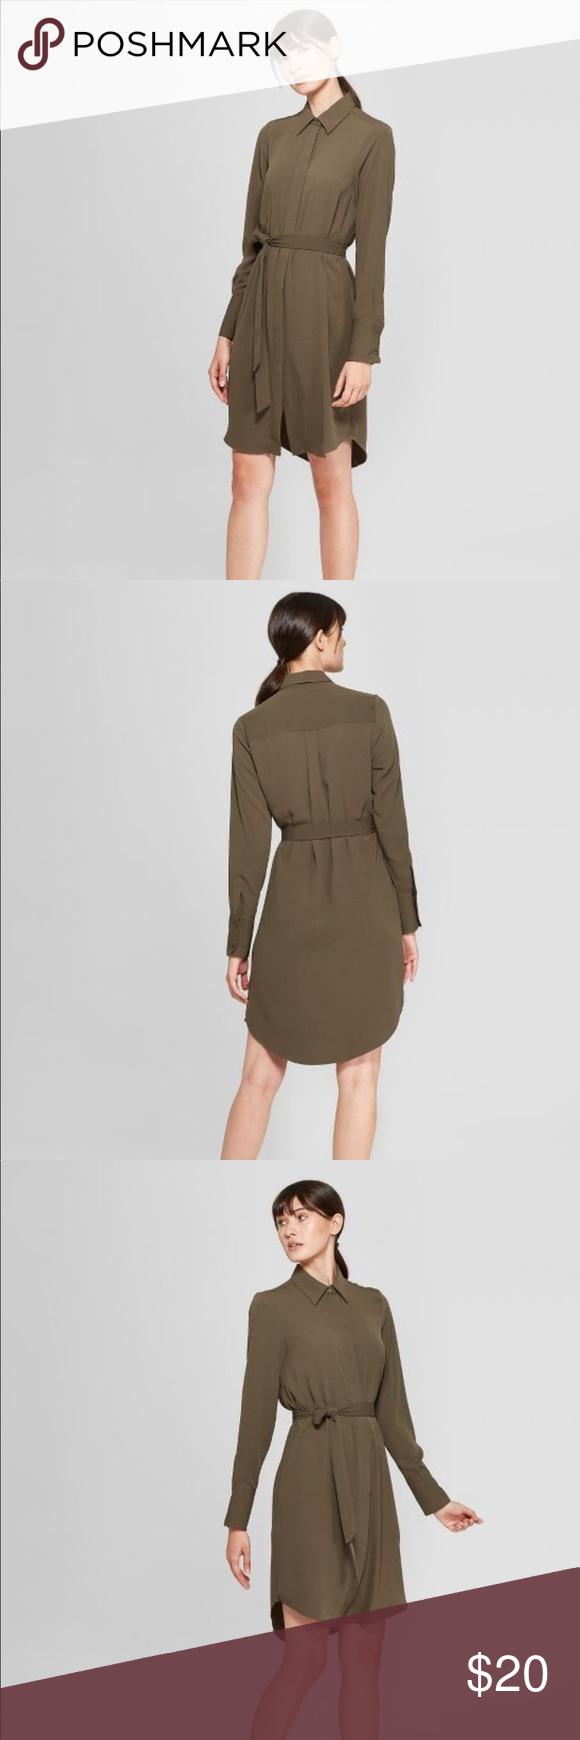 Target Long Sleeve Collared Shirtdress Olive Sz S Collared Shirt Dress Shirt Dress Long Sleeve [ 1740 x 580 Pixel ]